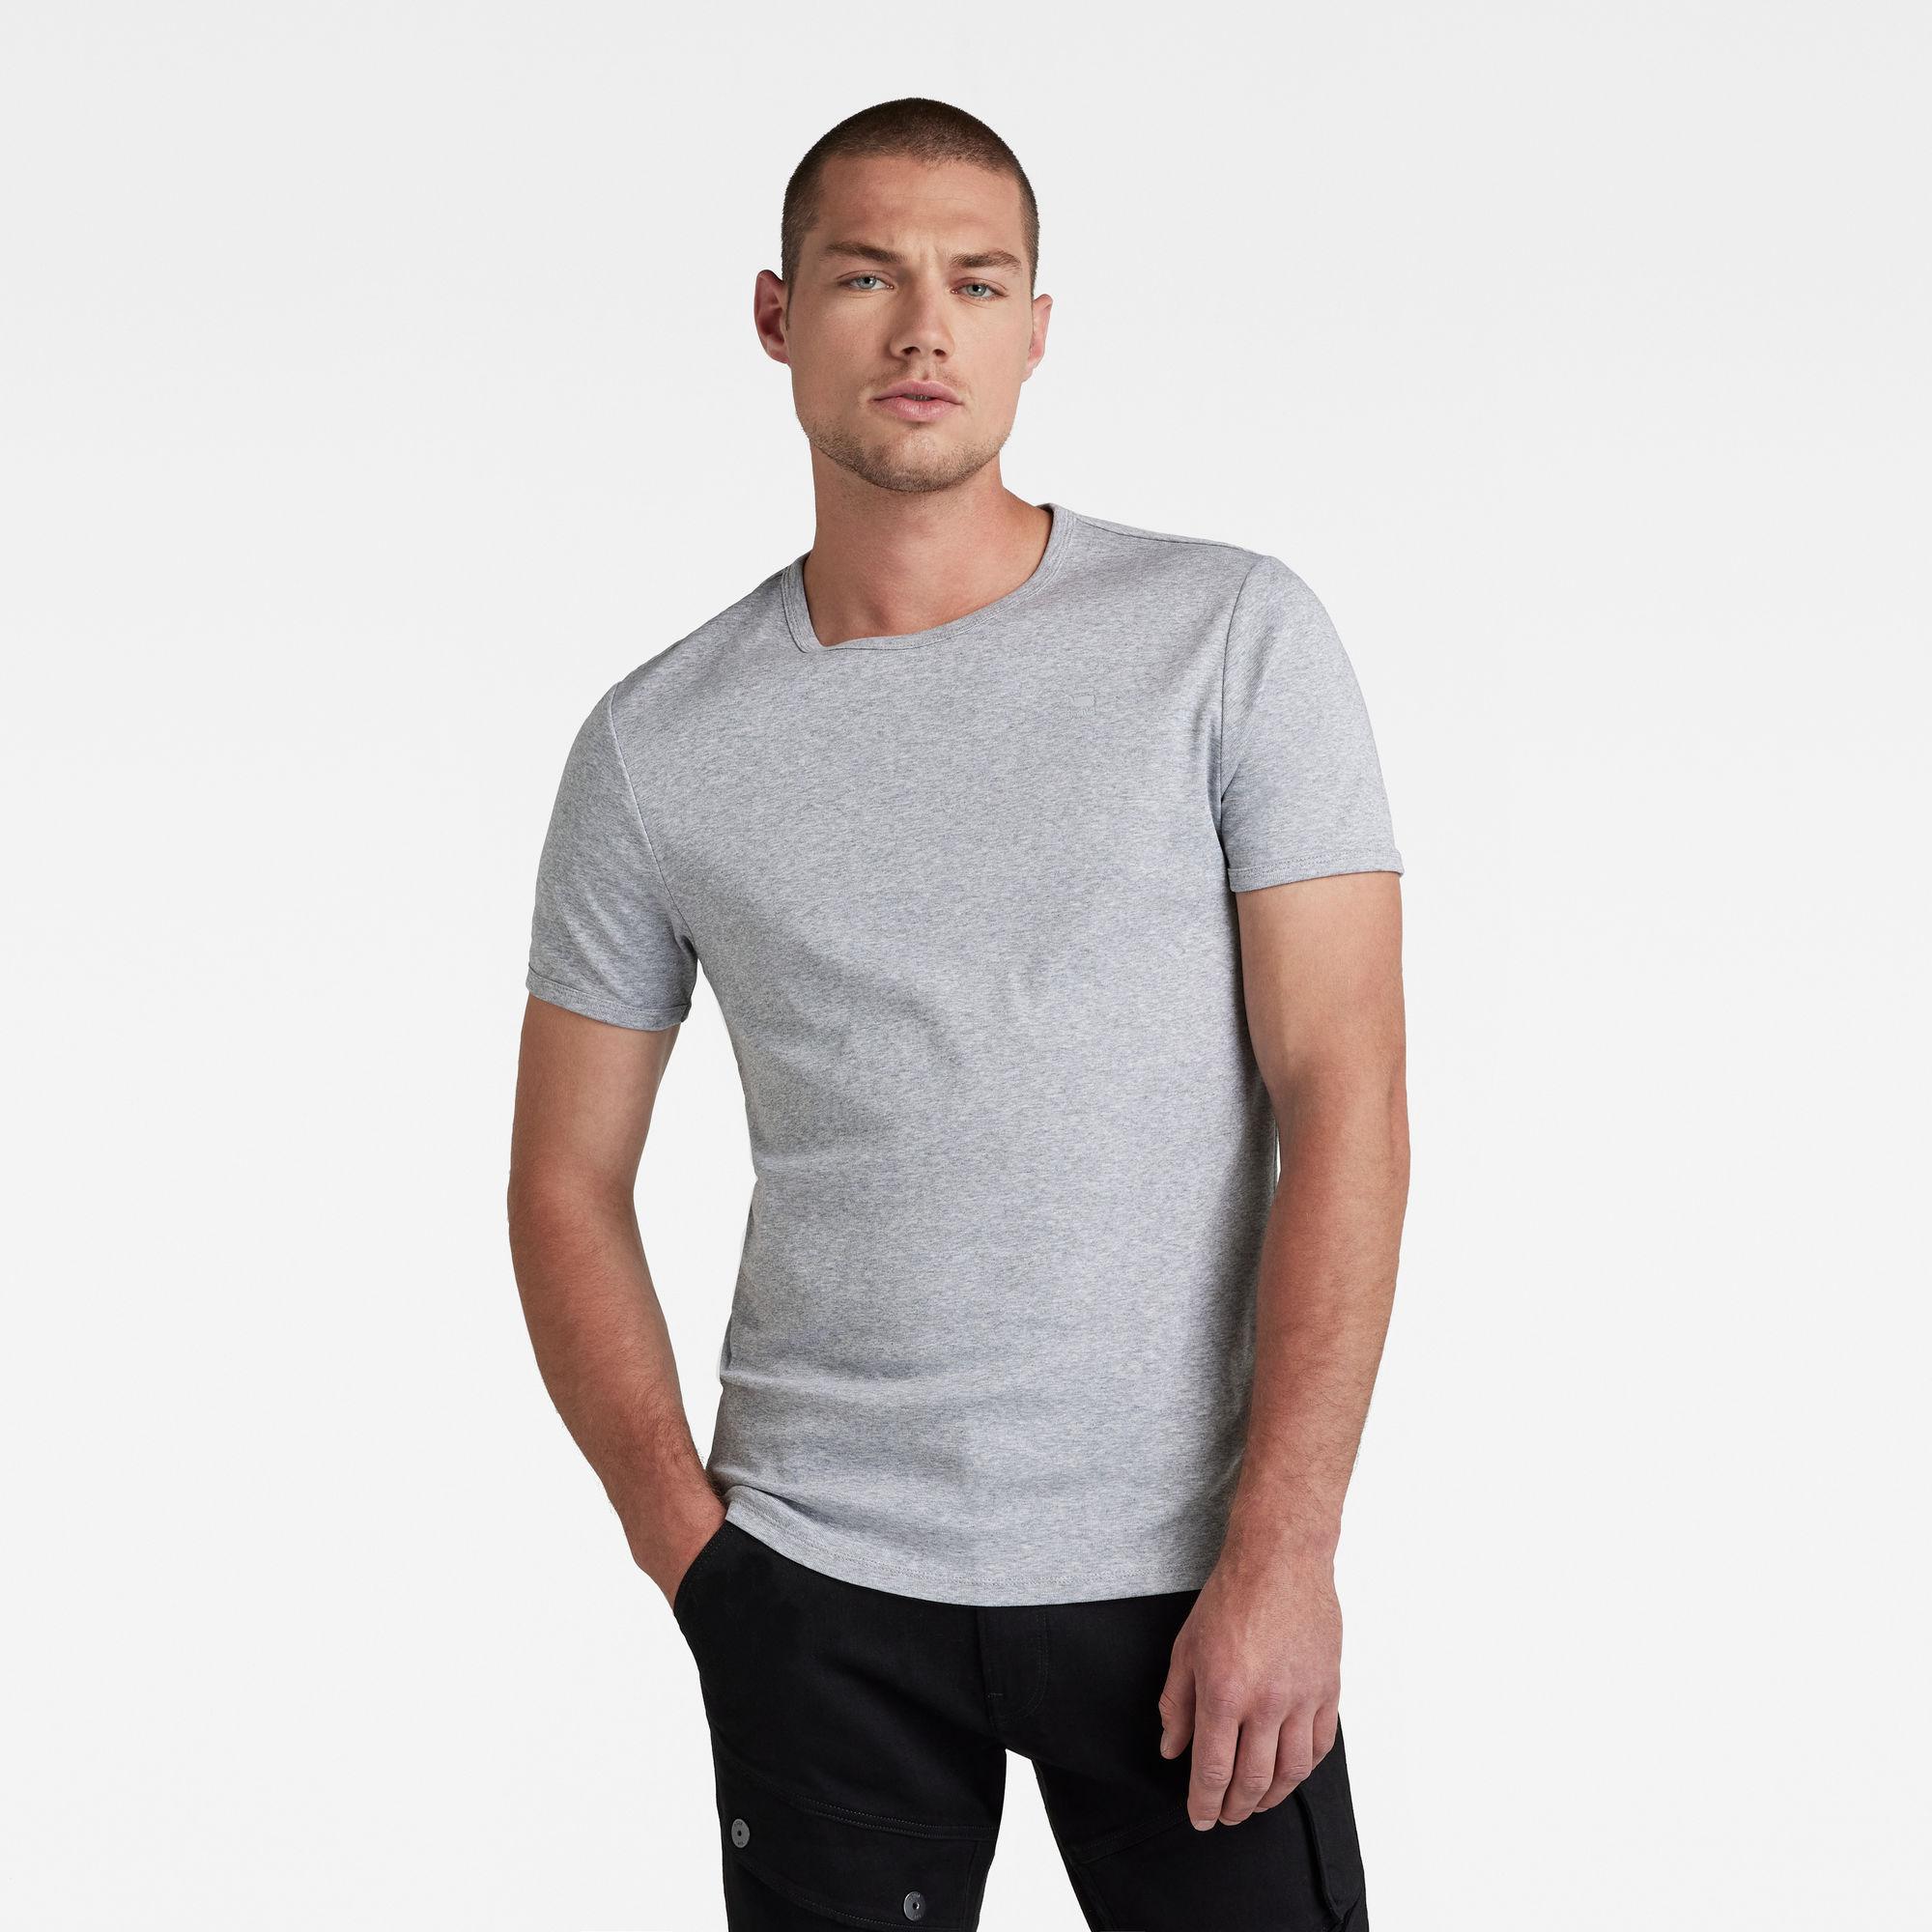 Van G Star Raw Basic Round Neck T-Shirt 2-Pack Prijsvergelijk nu!